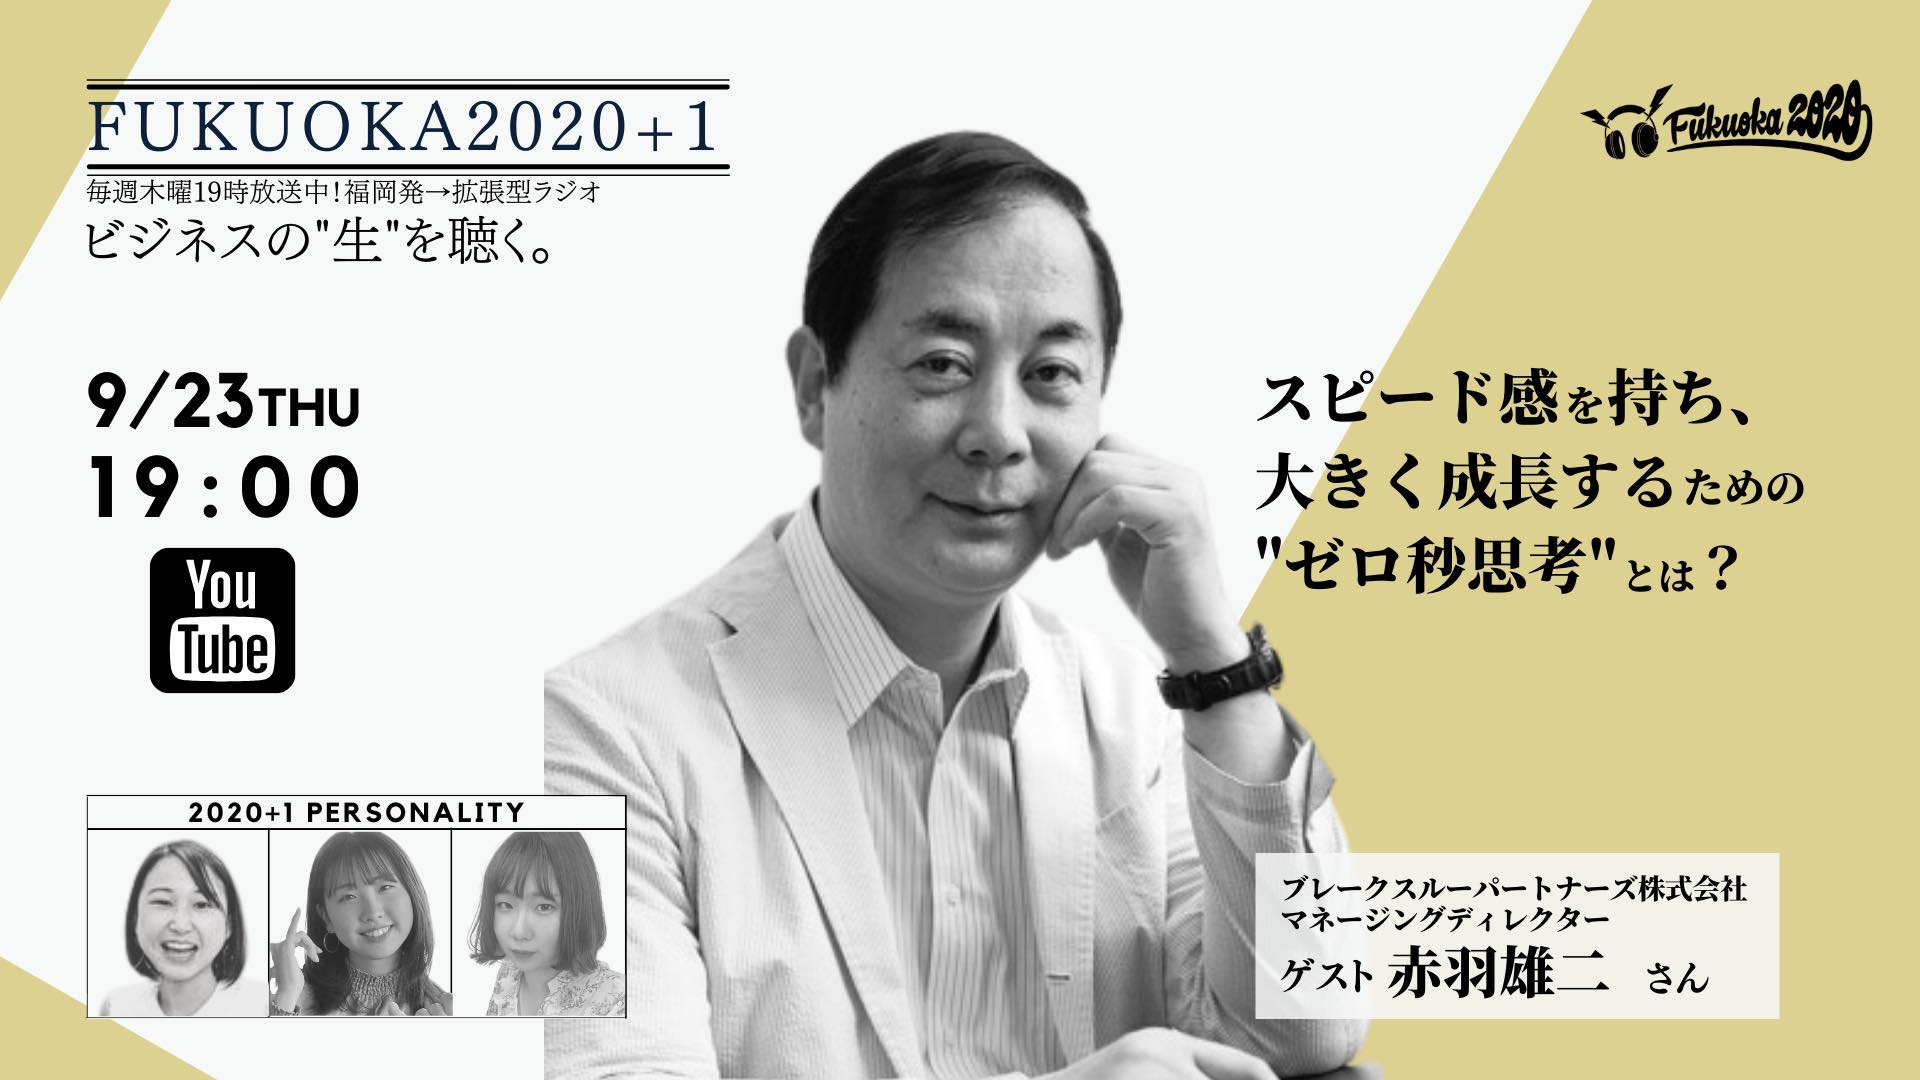 【LIVE】FUKUOKA2020 vol.156 |ゲスト:赤羽雄二さん